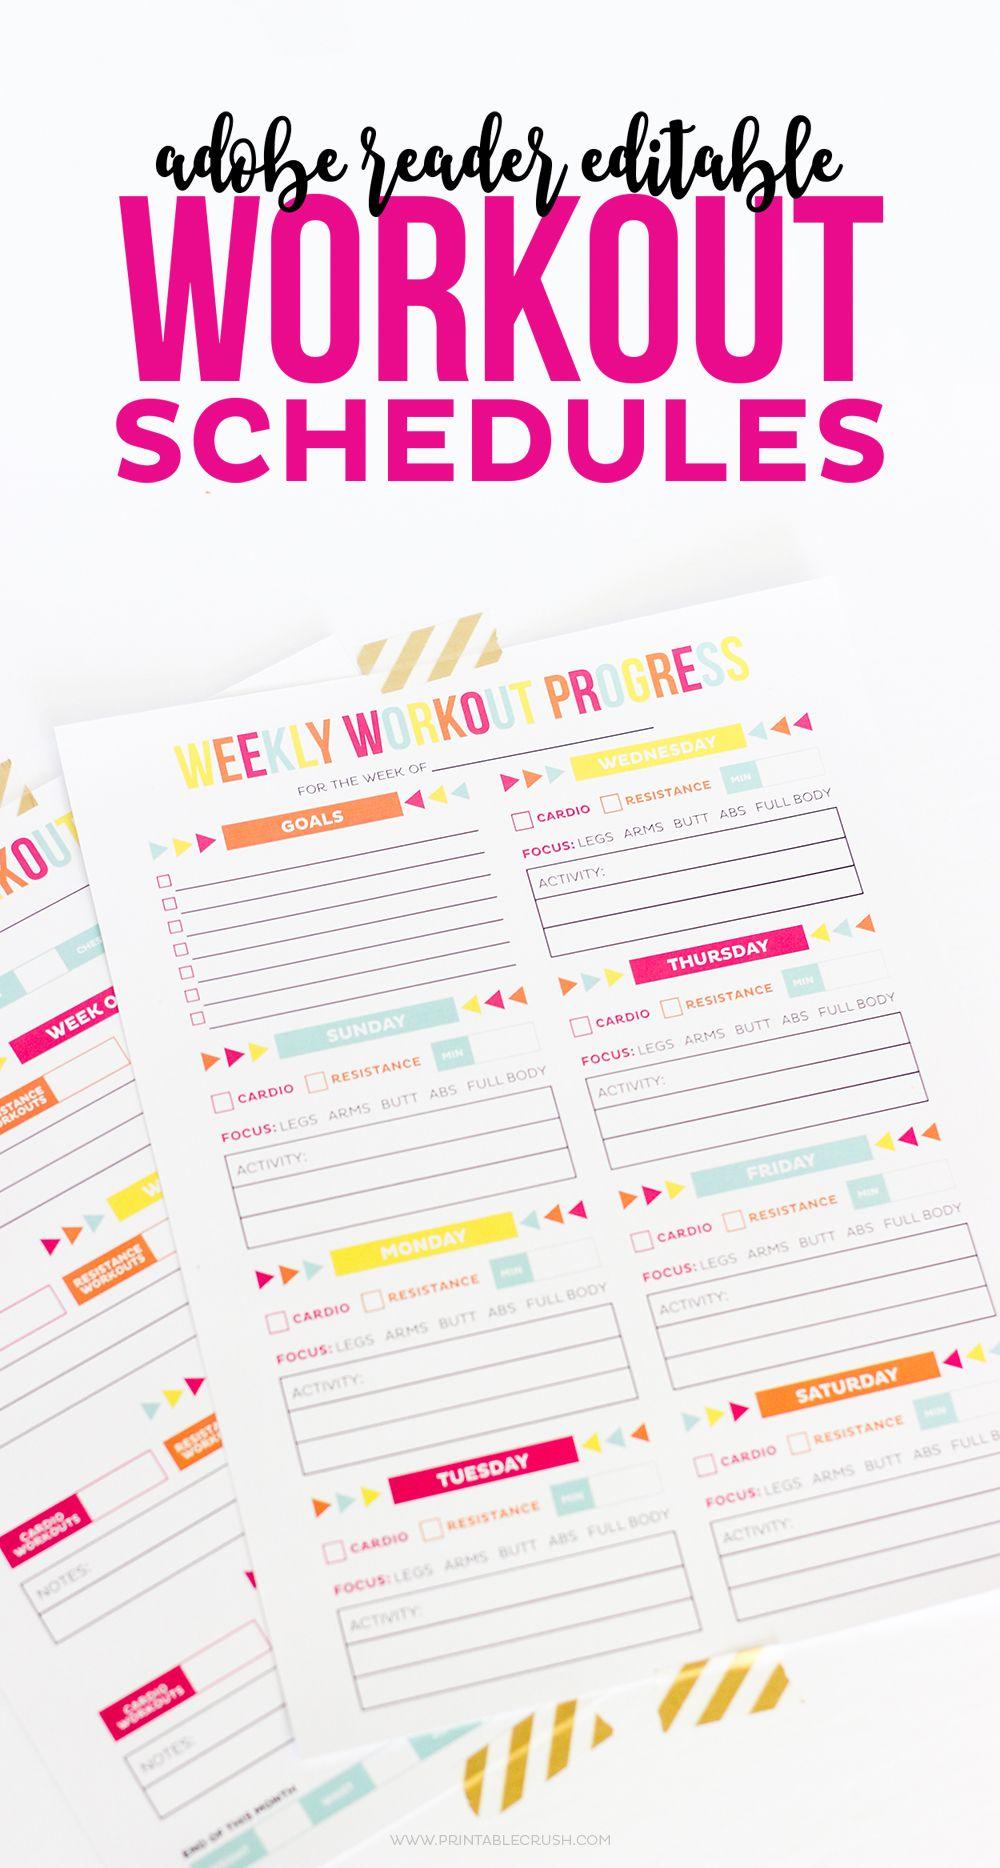 Editable printable workout schedule printable workouts